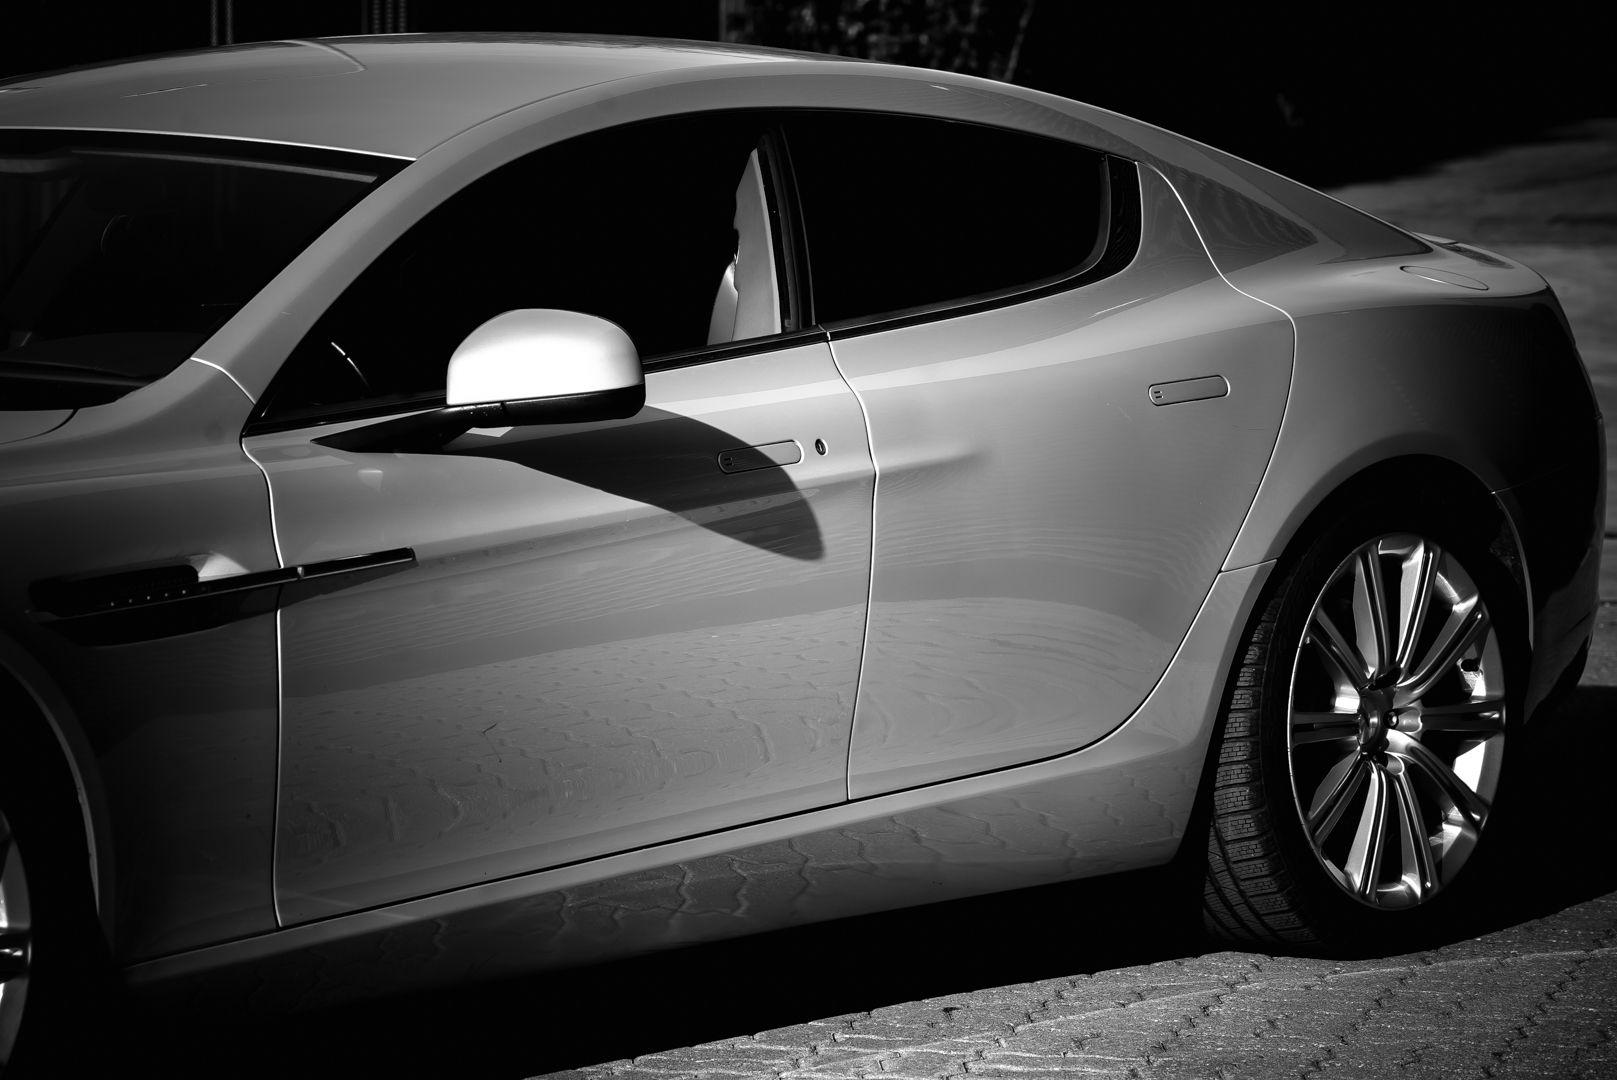 2010 Aston Martin Rapide 6.0 V12 62611